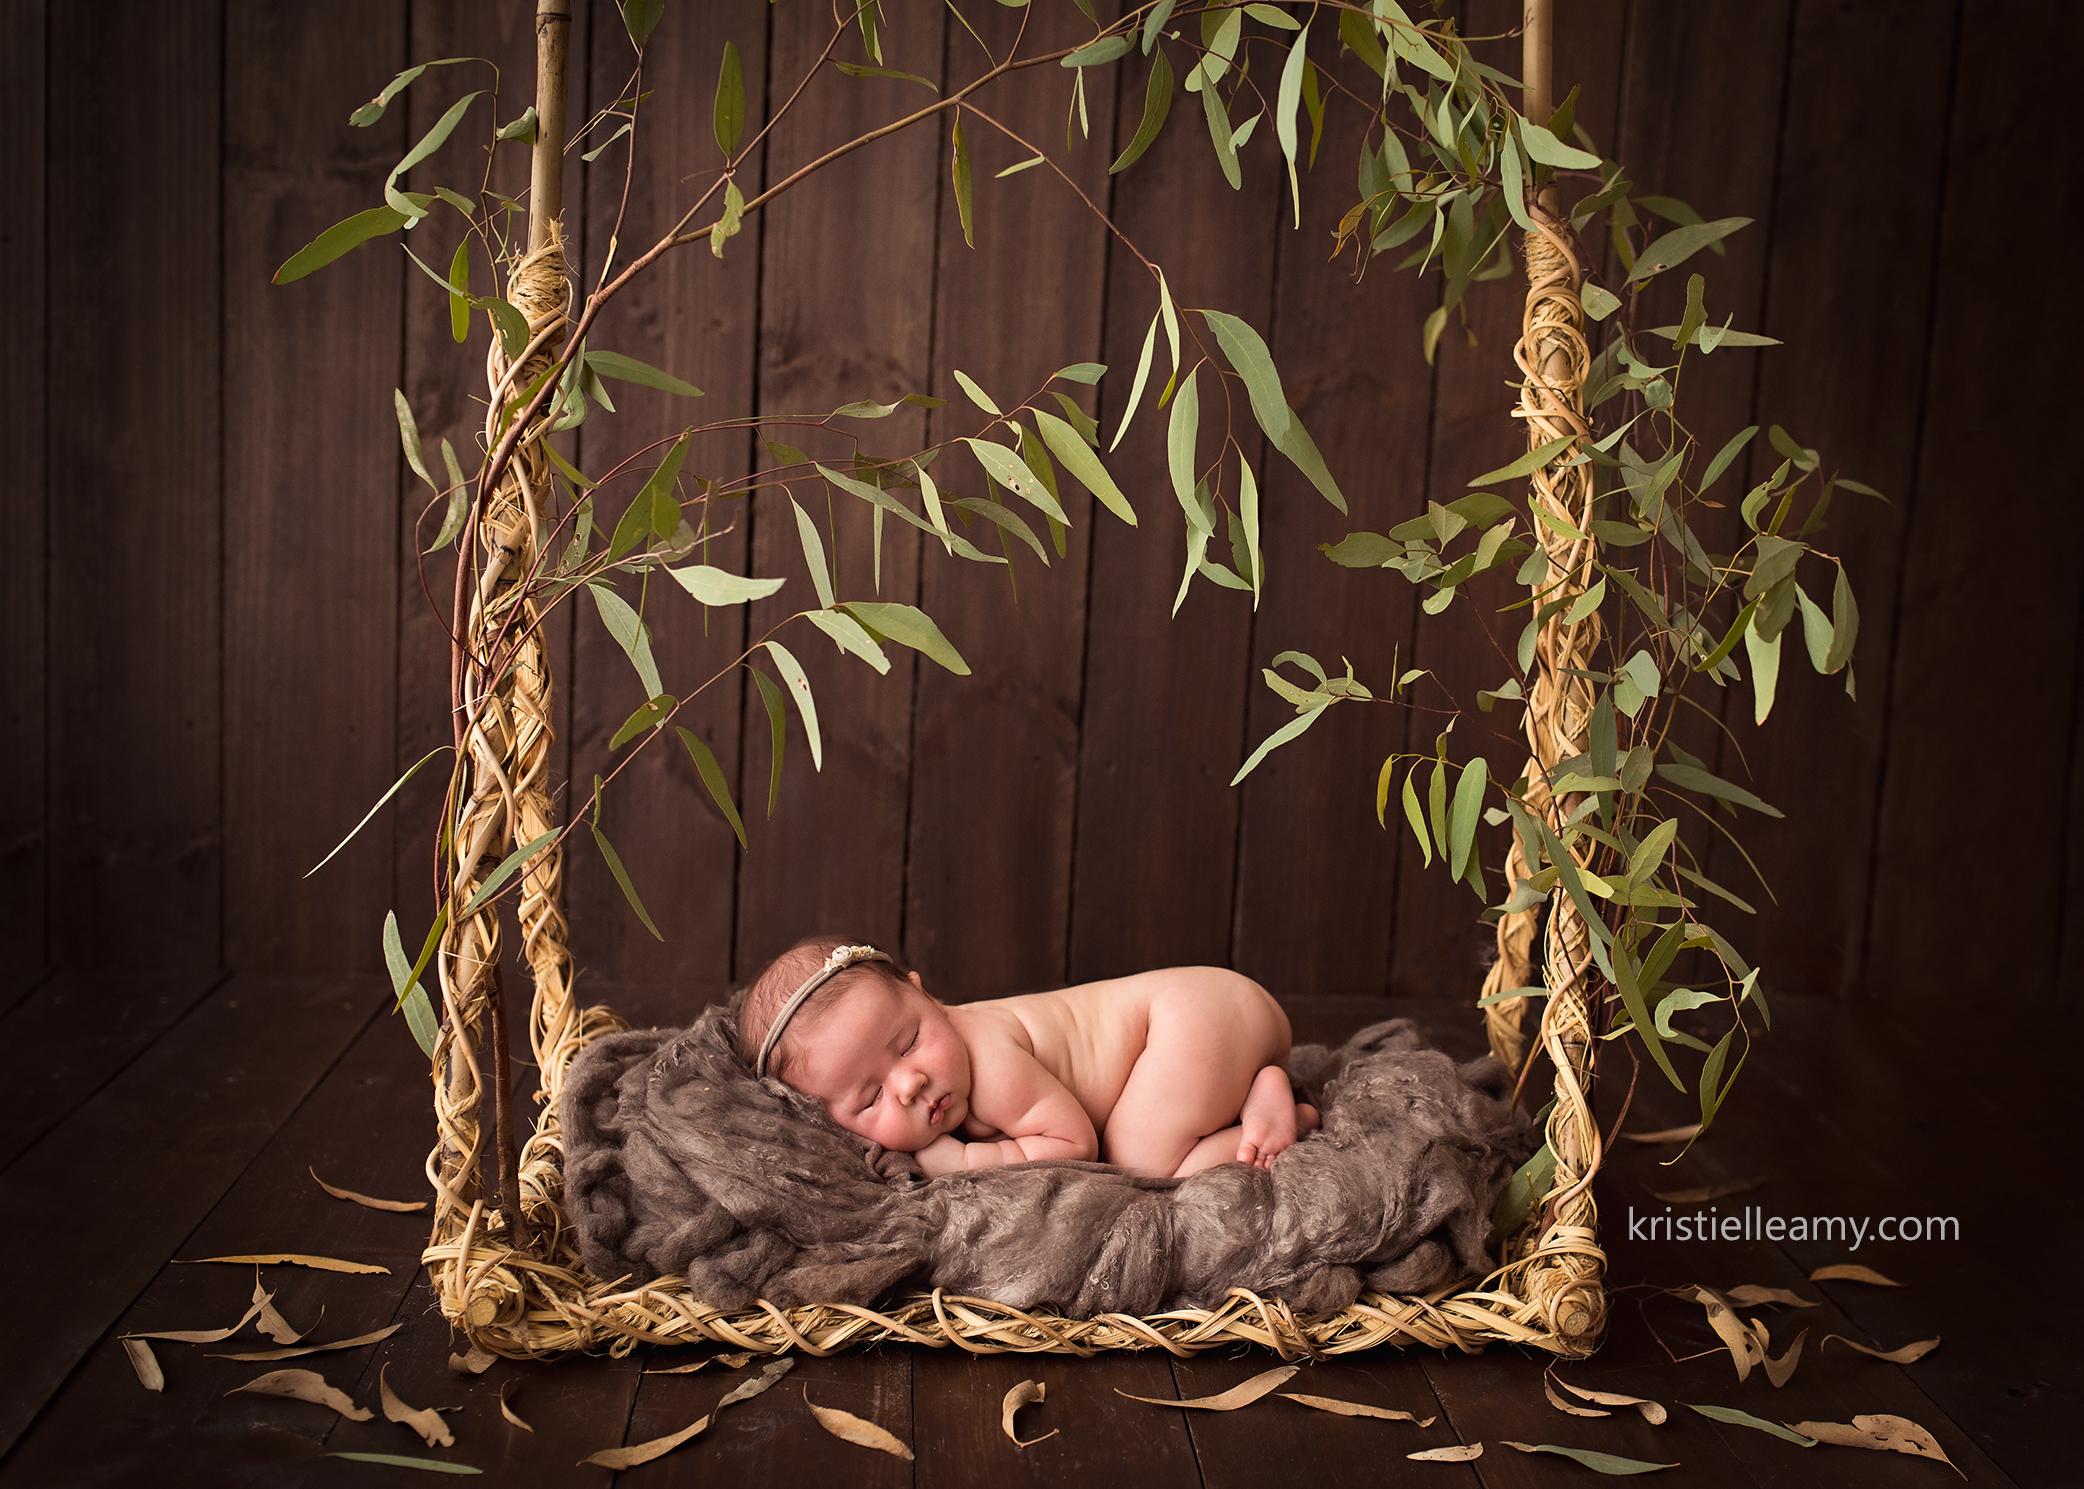 5 week old baby girl echuca newborn photography photographed by echuca newborn photographer kristielle amy photography